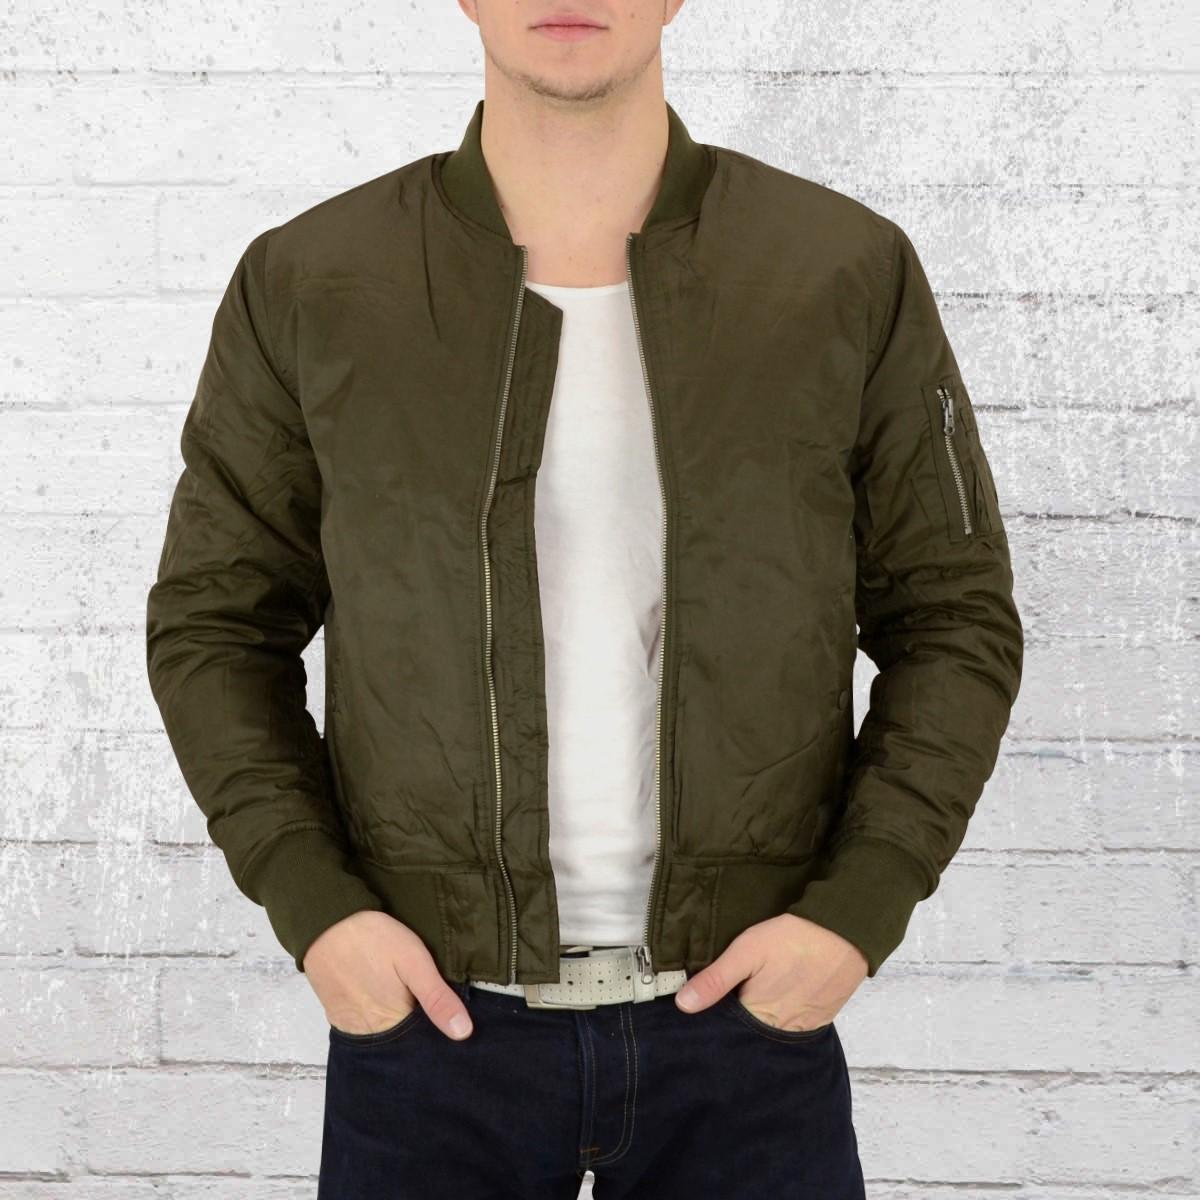 Olive Jacket Order Mens NowUrban Classics Bomber Dark thsrdQCx